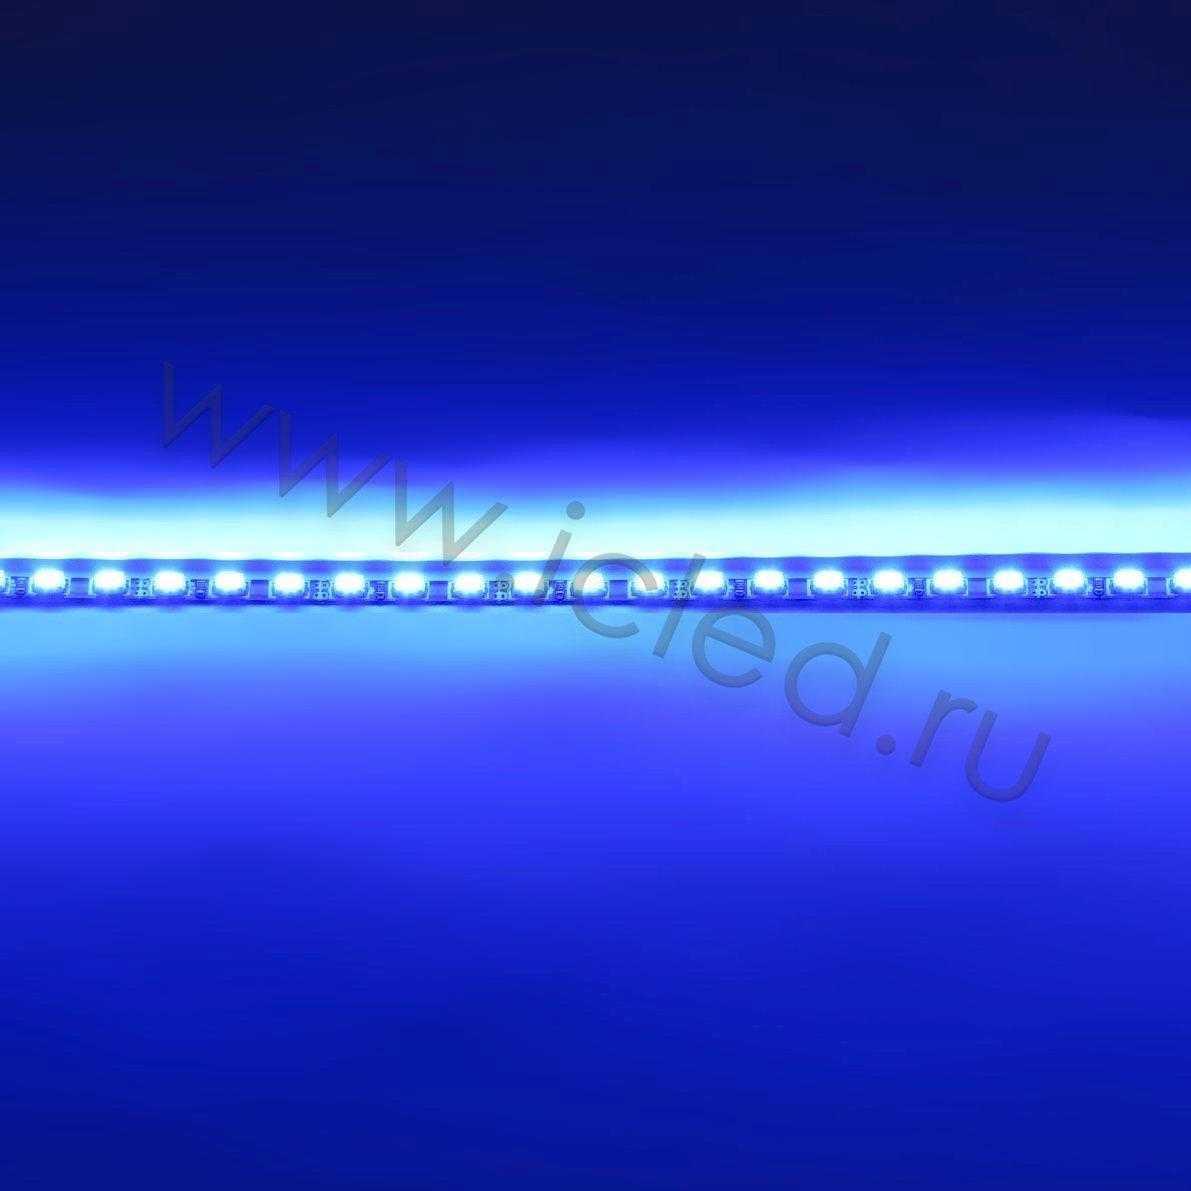 Светодиодная линейка для LCD, 3020, 48led, Blue, 12V, IP33